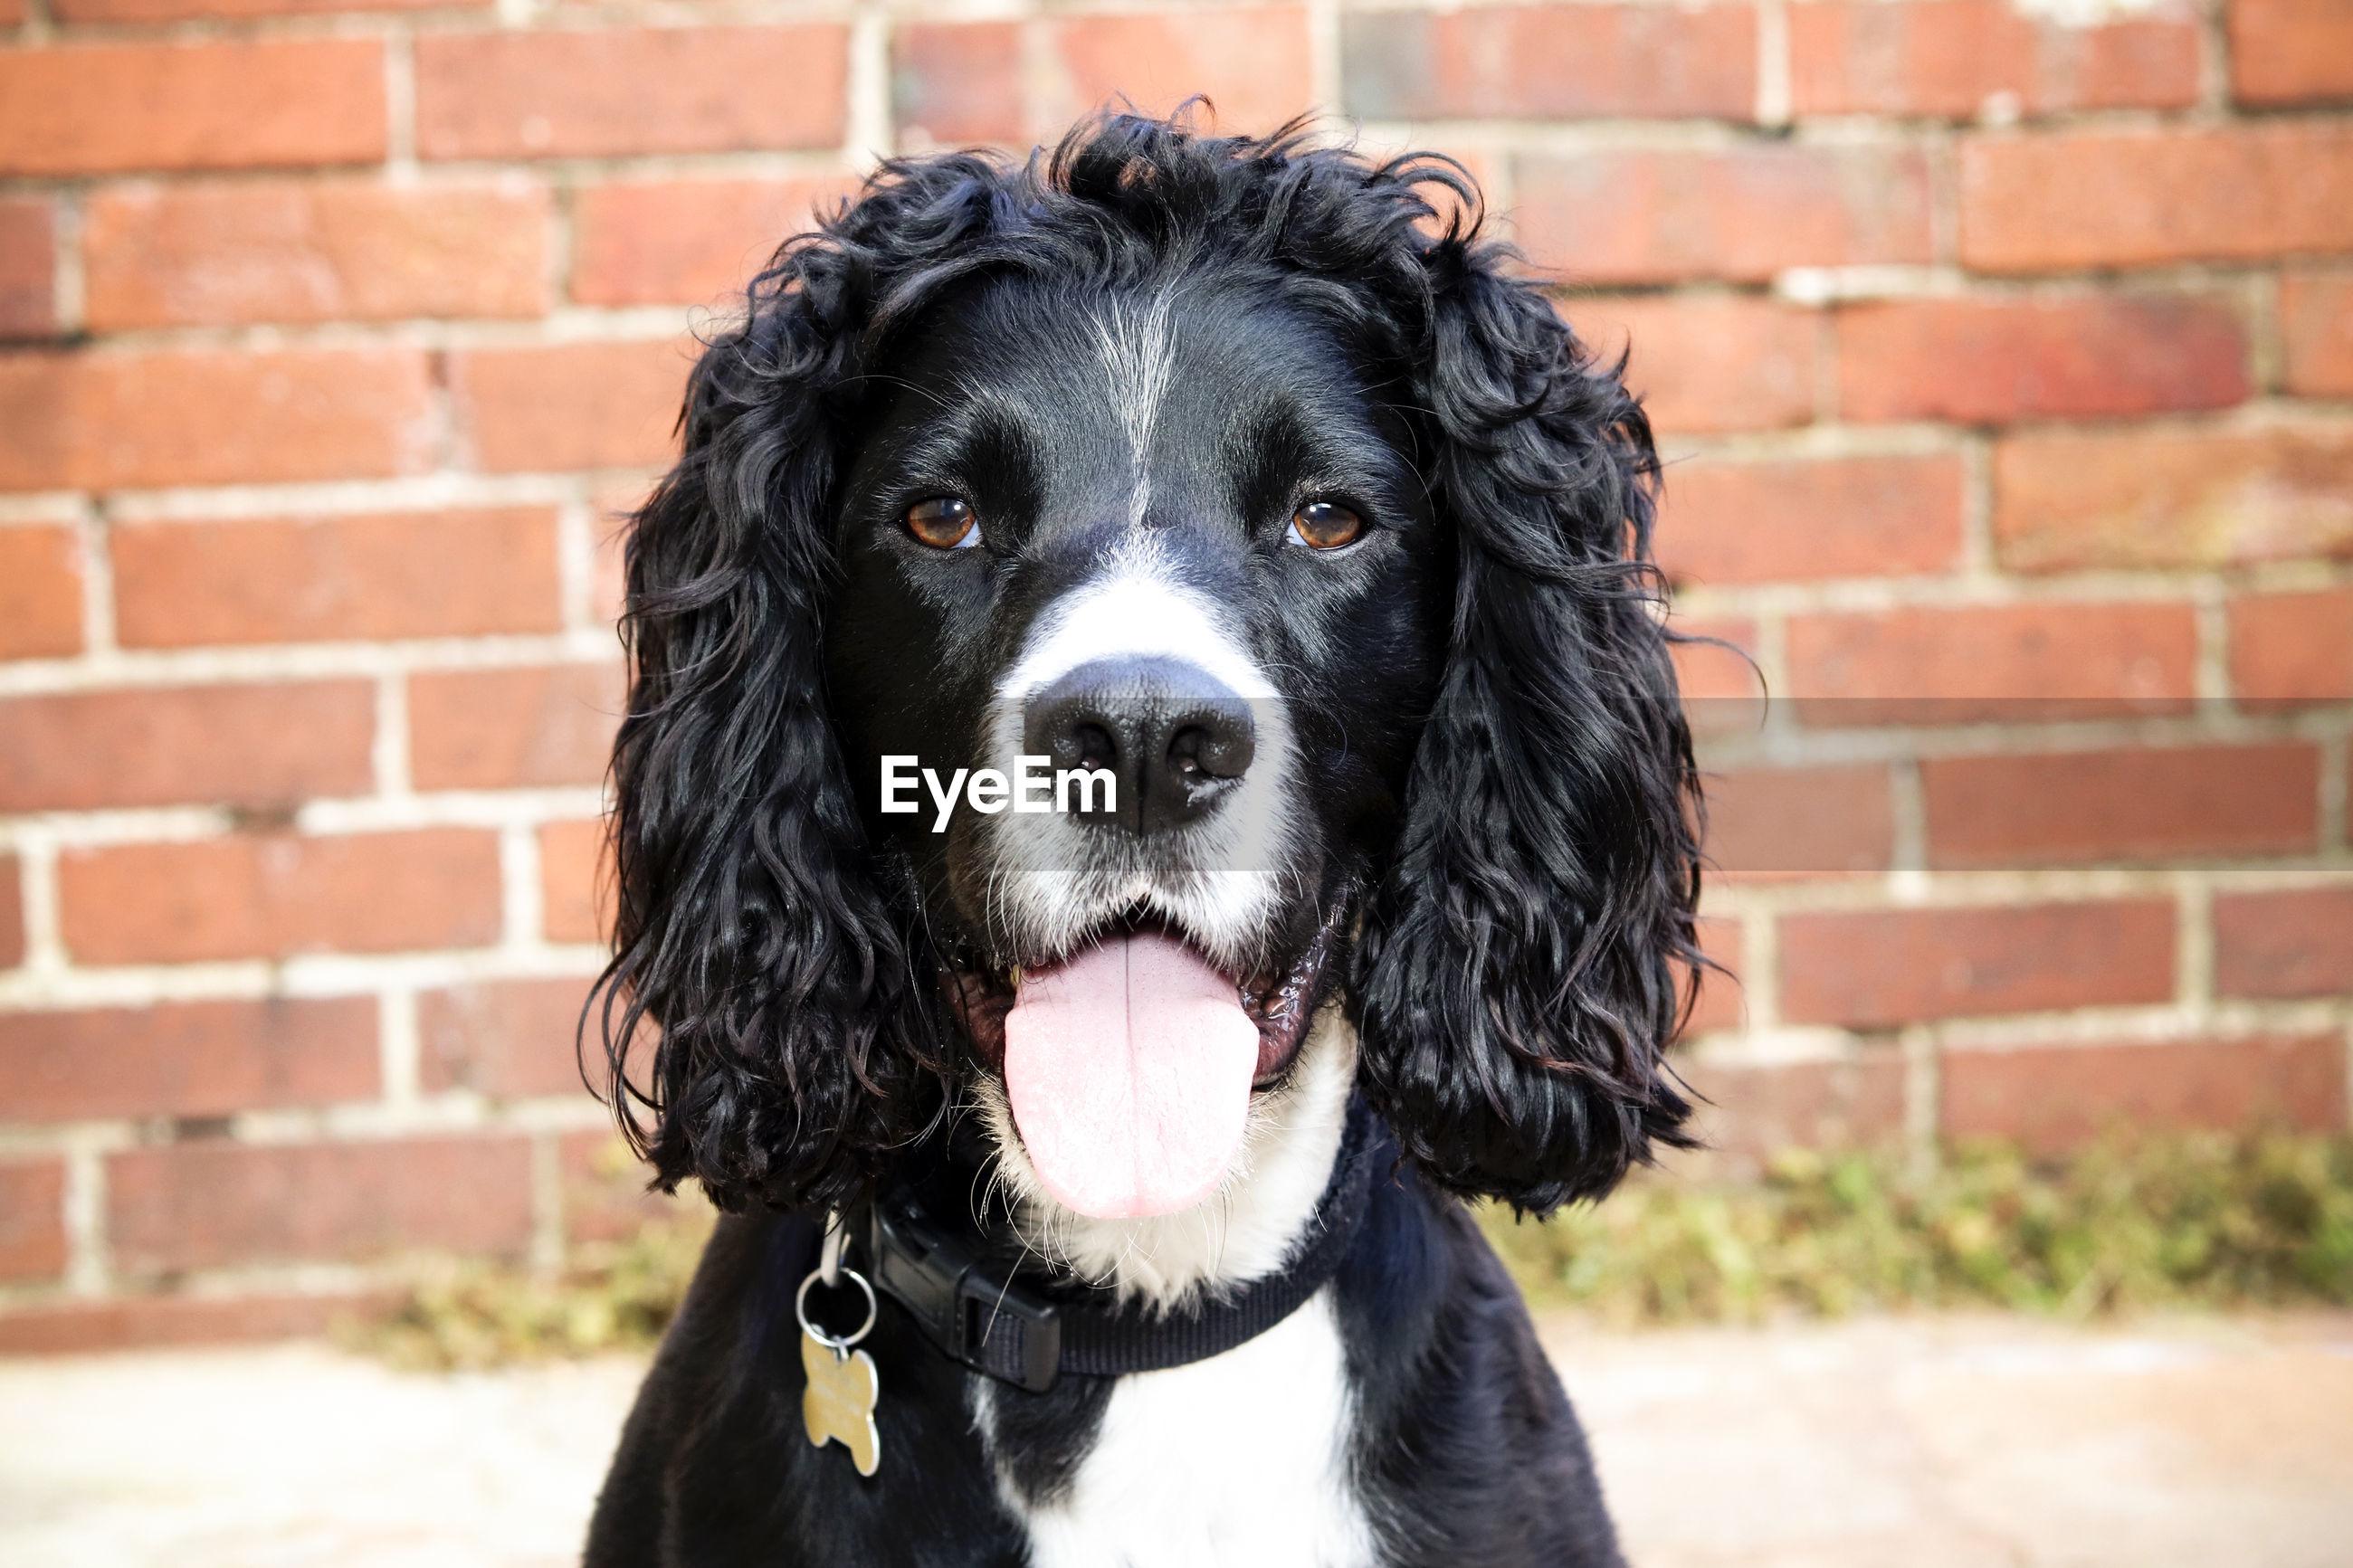 PORTRAIT OF A BLACK DOG AGAINST WALL